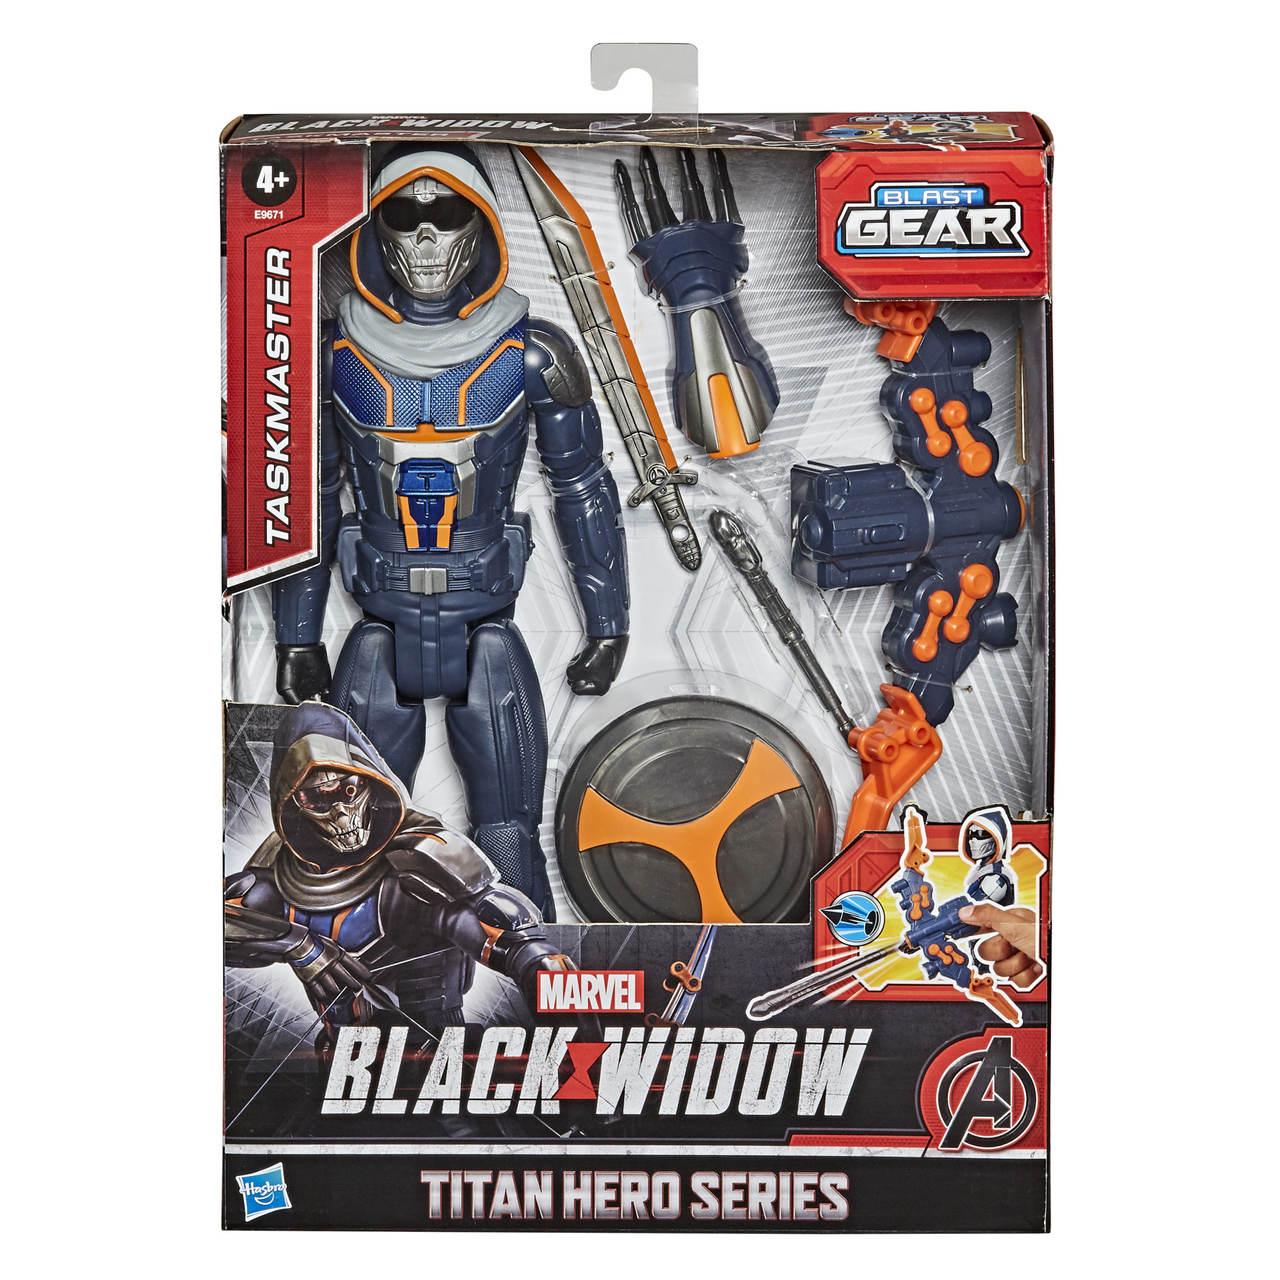 Boneco Vingadores Taskmaster Black Widow - Hasbro E9671